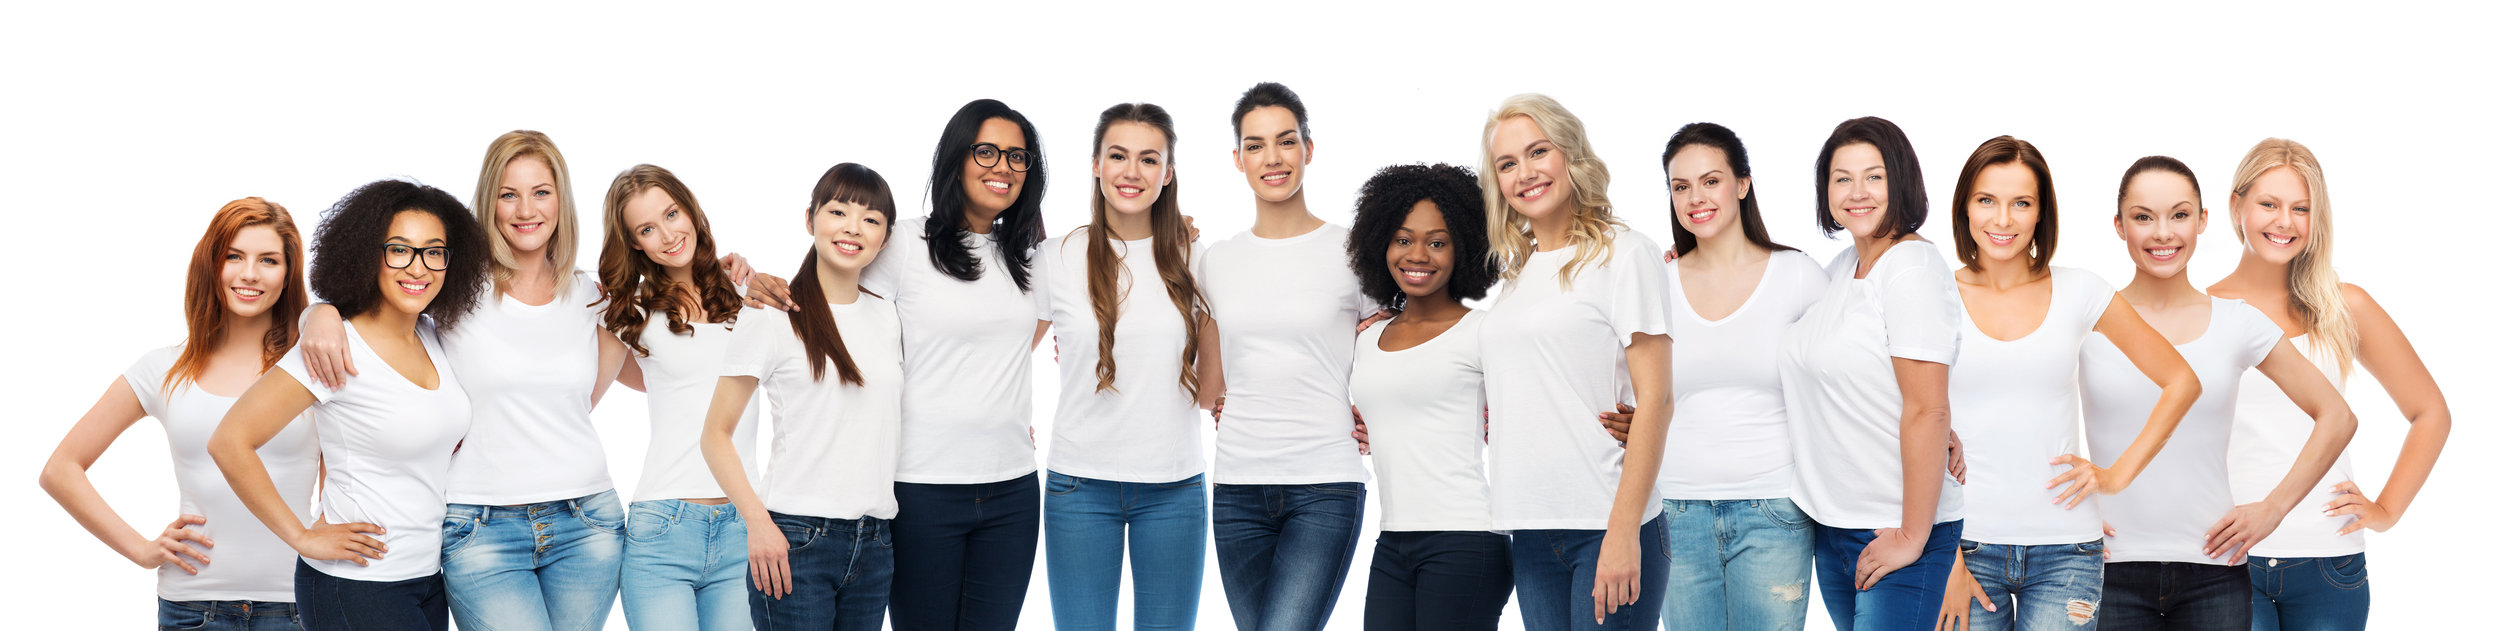 PowerJournal Women AdobeStock_207428025.jpeg